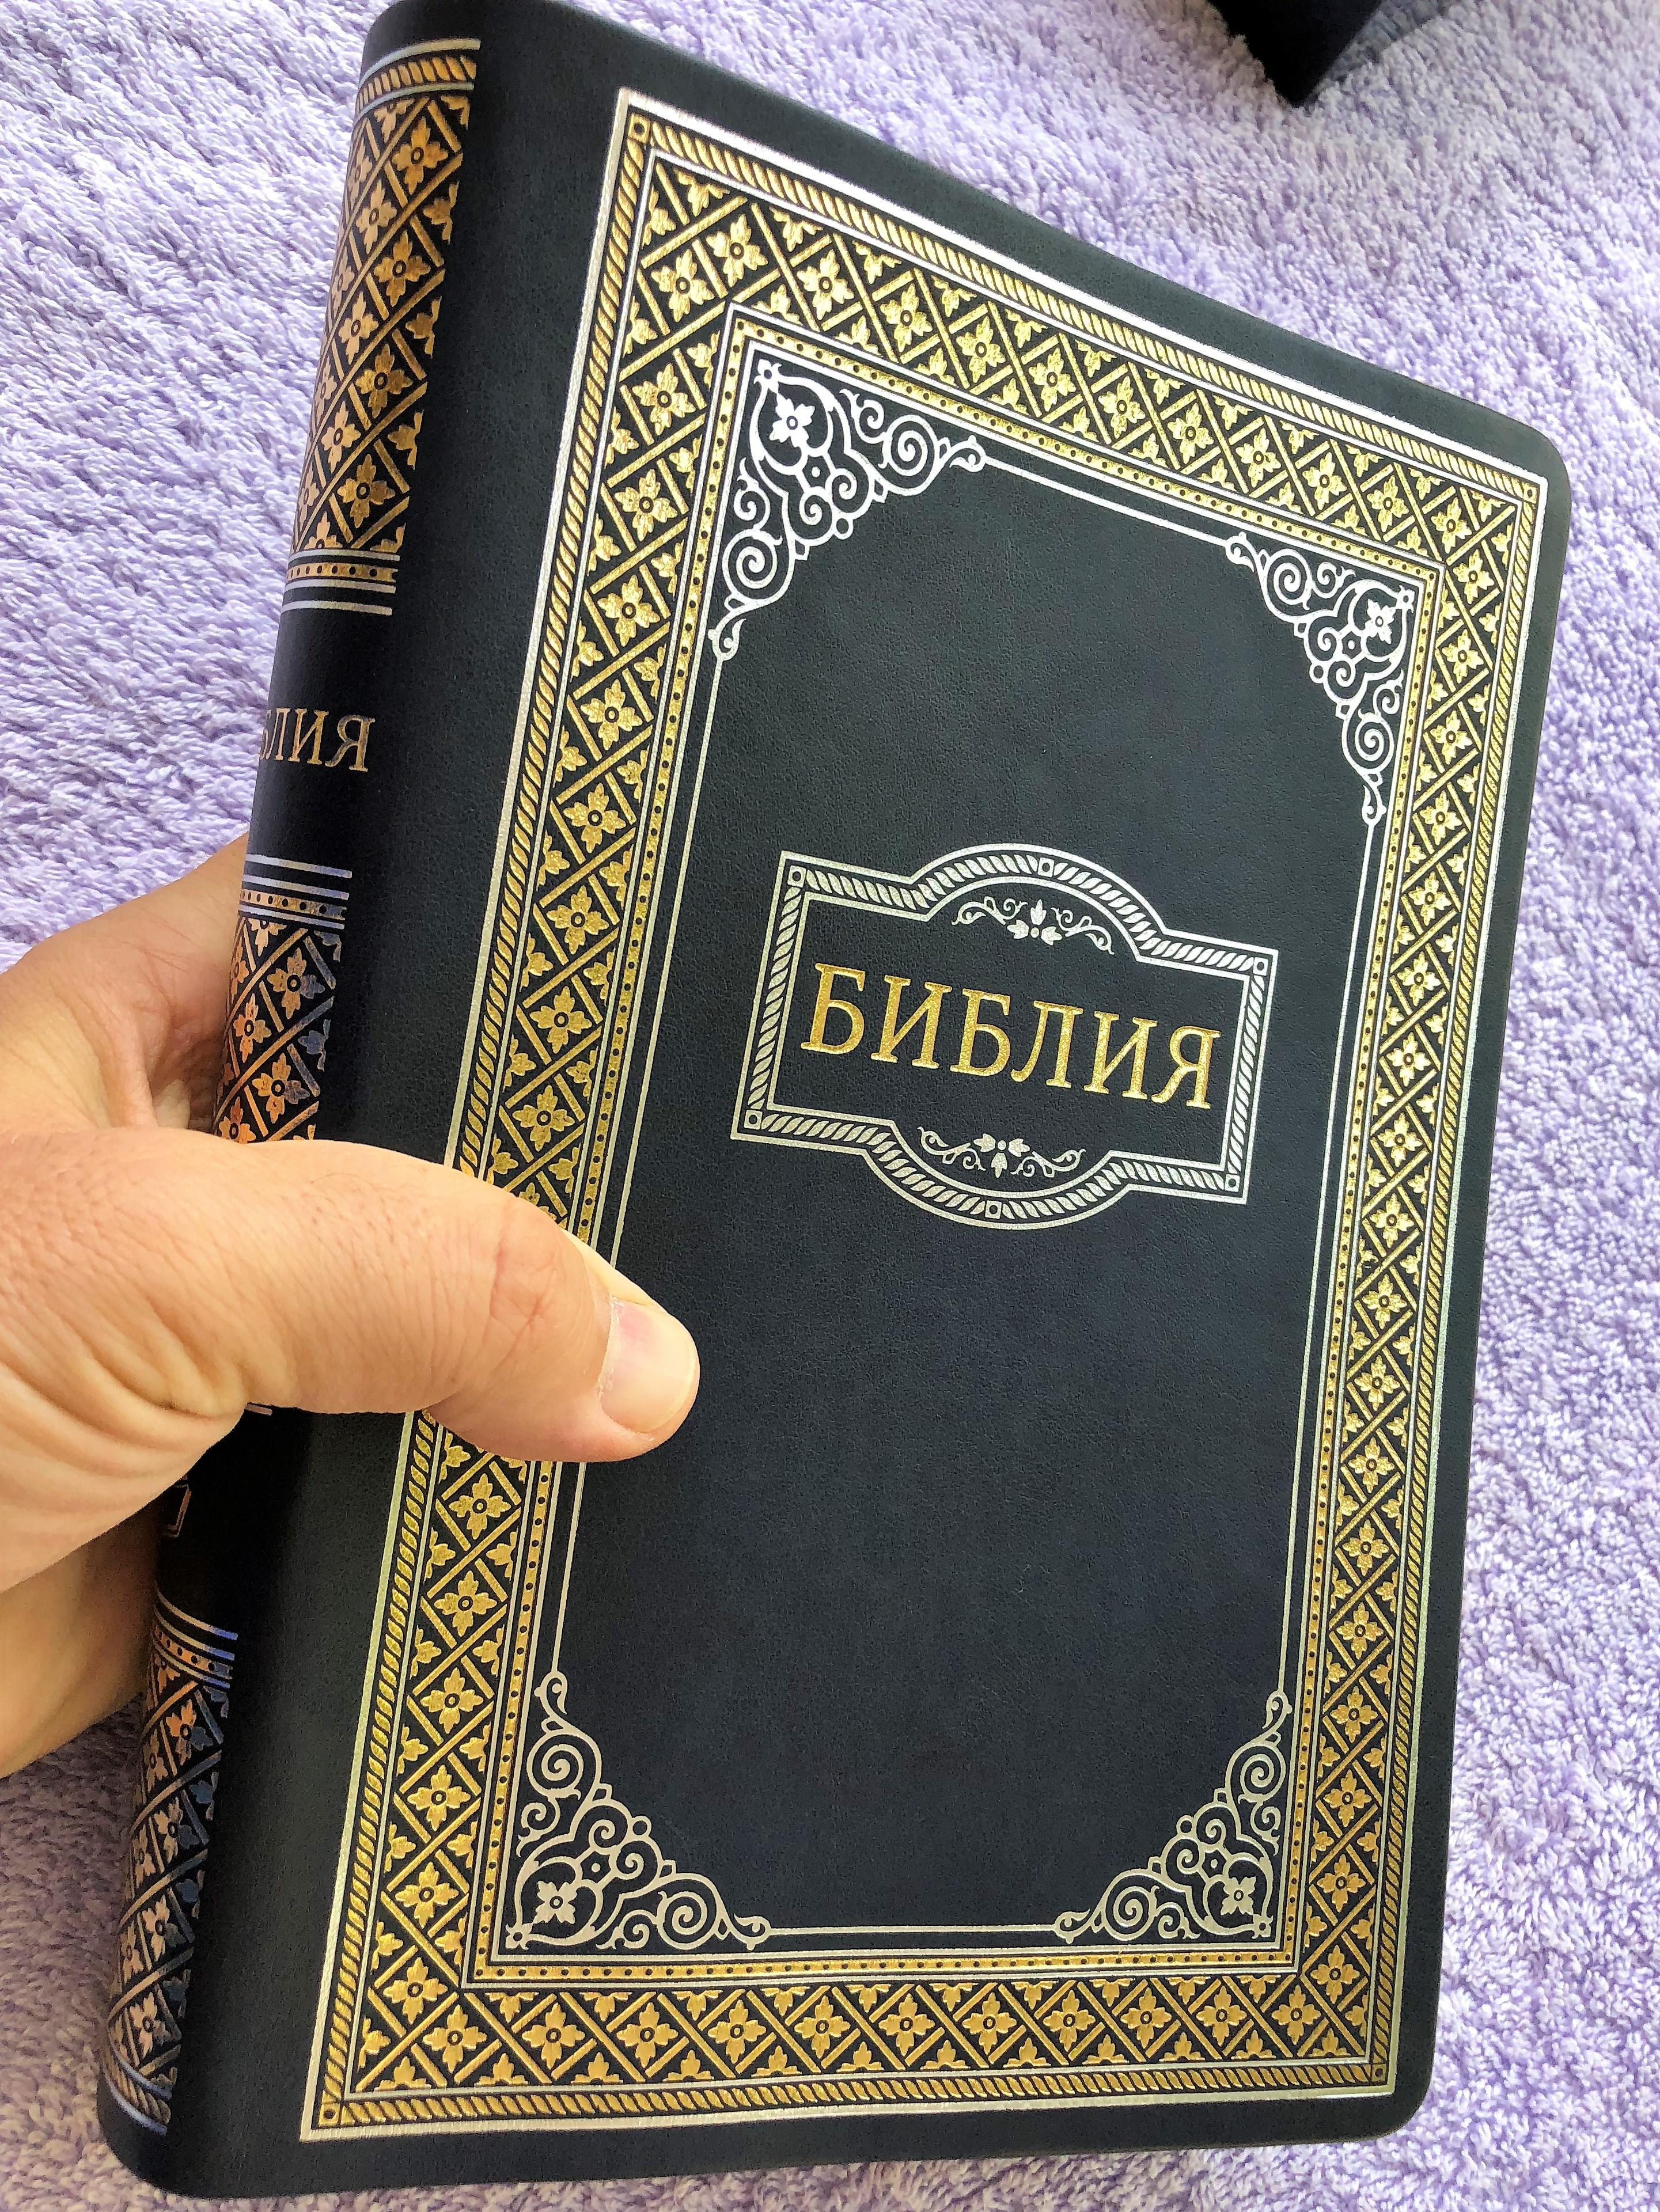 russian-bible-artistic-beautiful-cover-21-.jpg